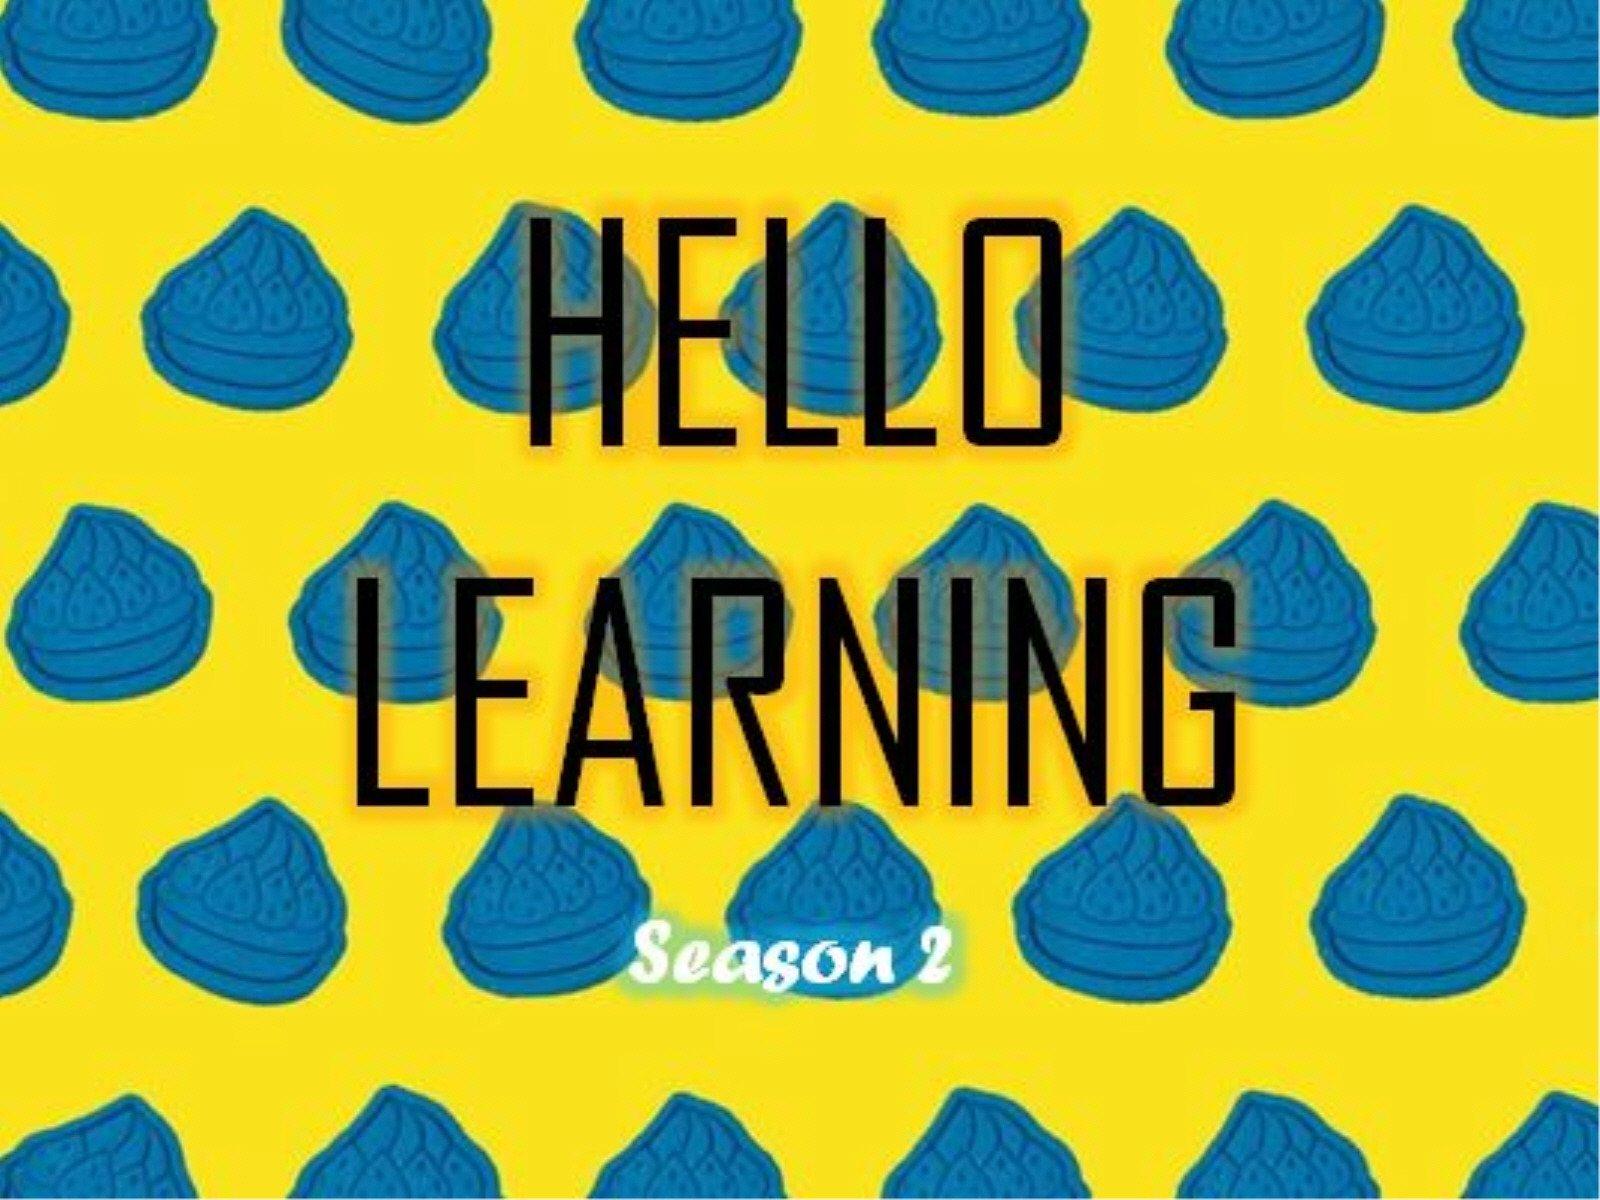 Hello Learning - Season 2